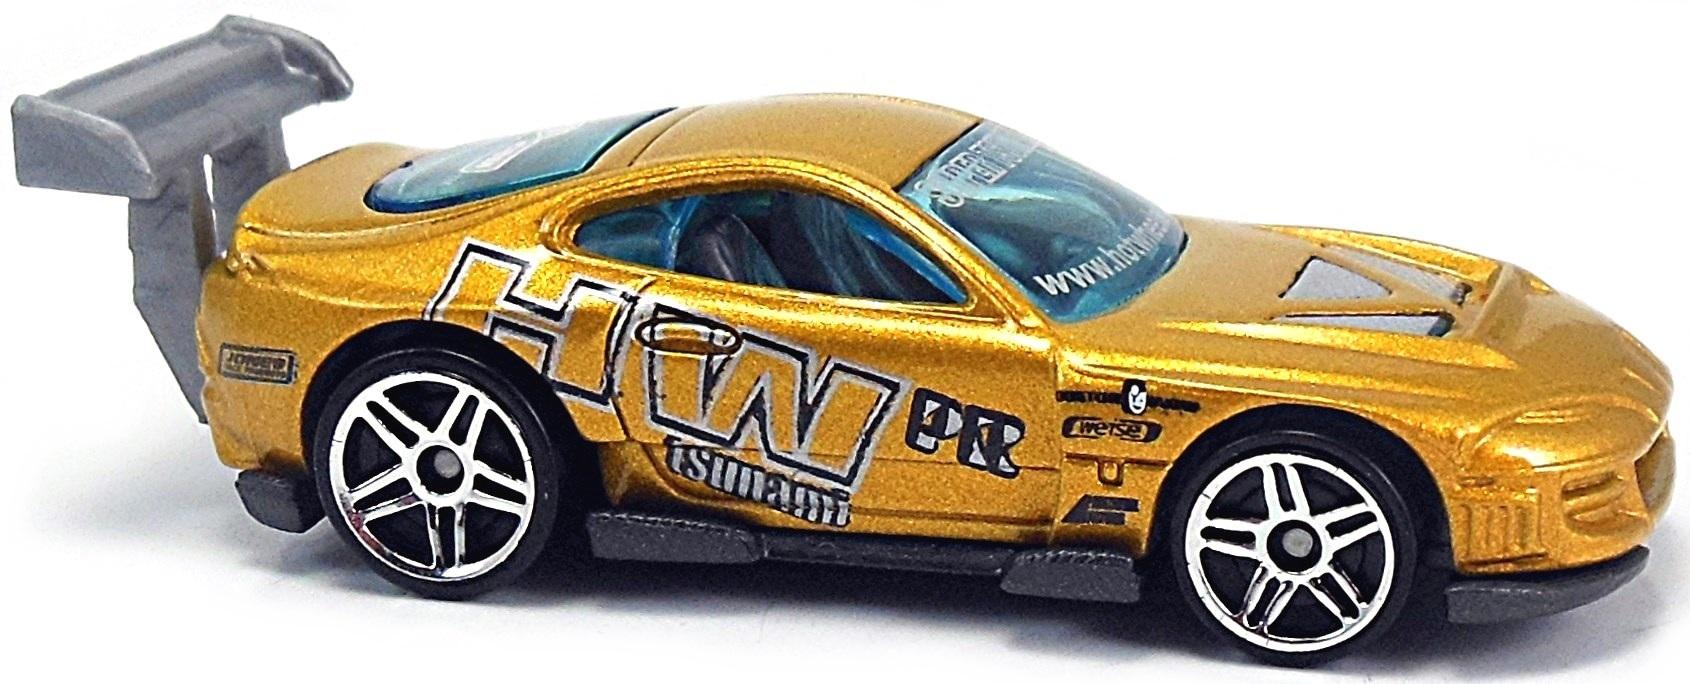 tsunami 78mm 2002 wheels newsletter